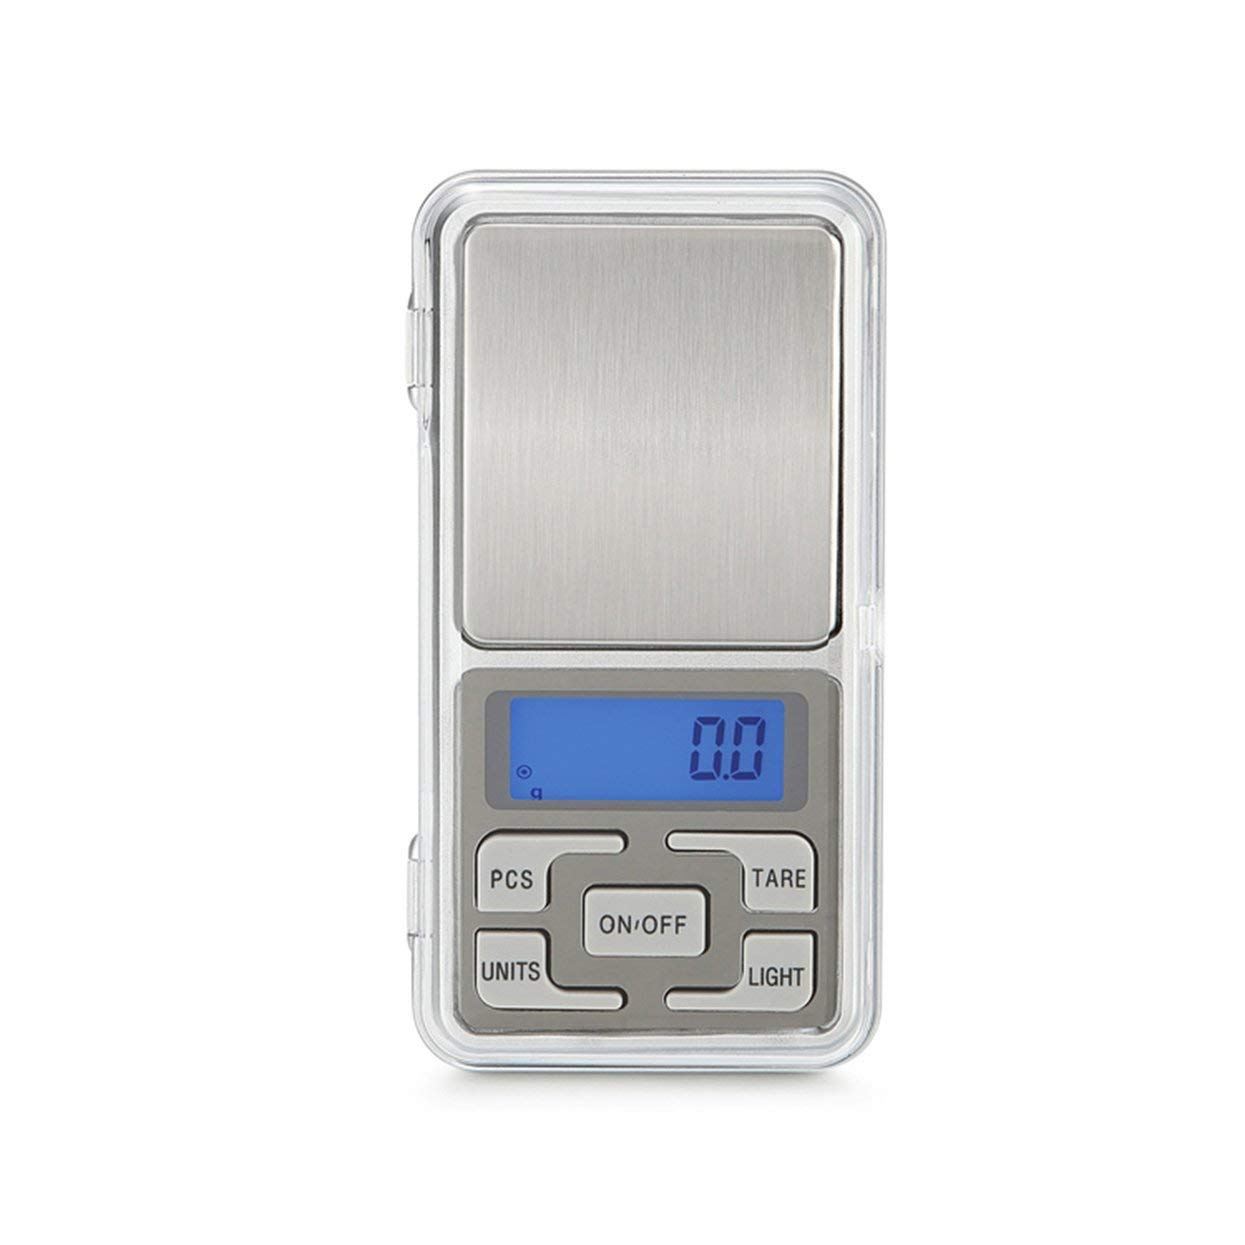 Tree-on-Life HT-668B 500 g x 0.01 g Mini balanza digital de precisi/ón para la balanza de plata esterlina de oro Balanza de joyer/ía Balanza balanzas electr/ónicas